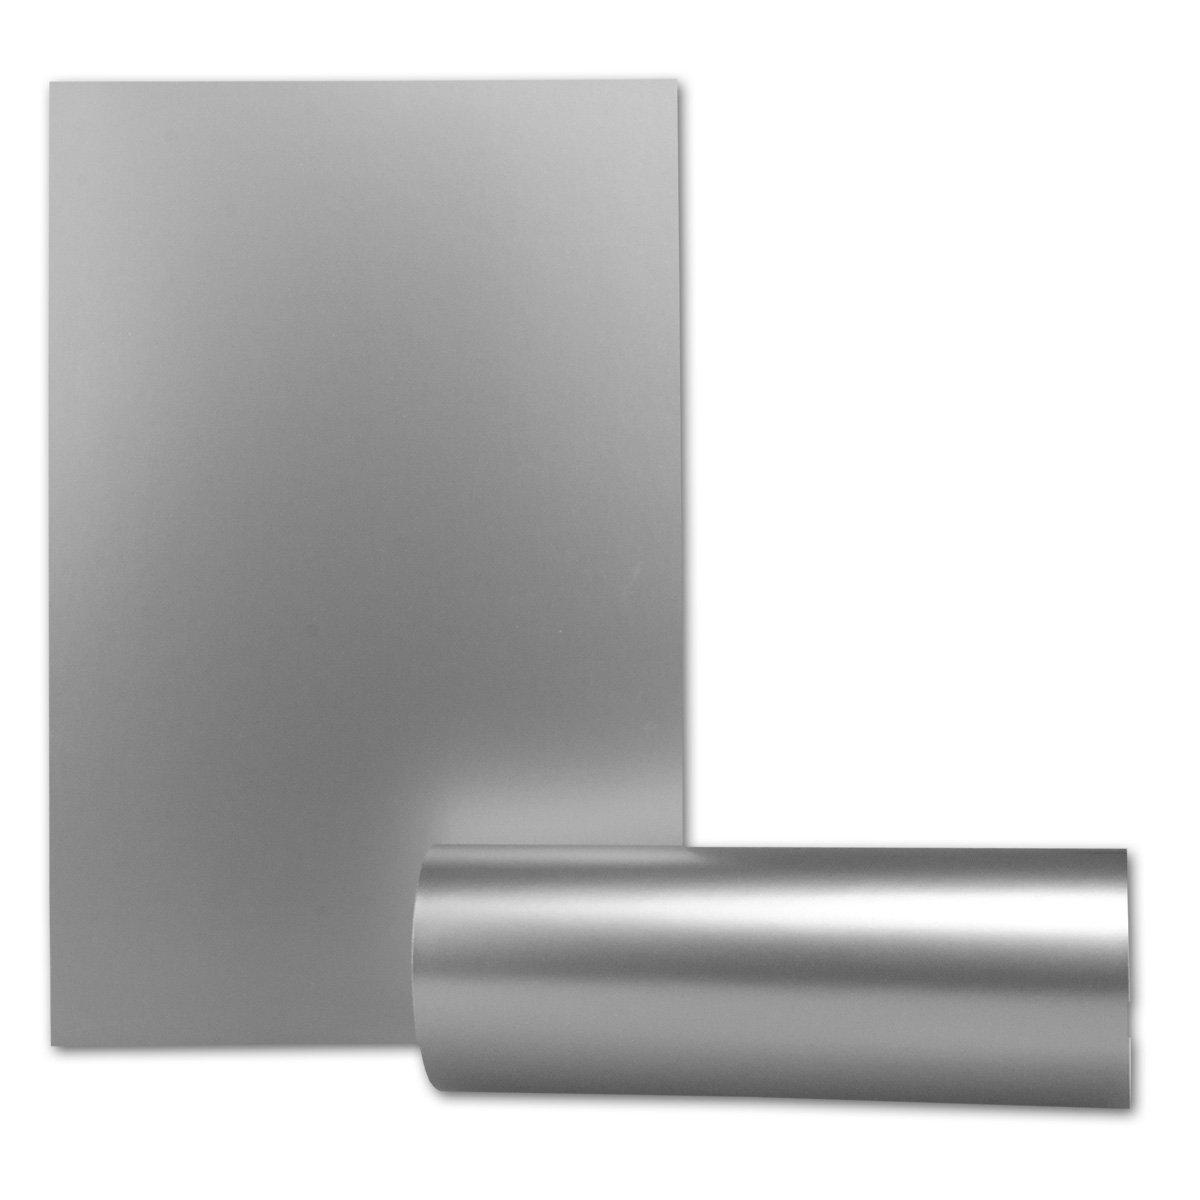 FarbenFroh by GUSTAV NEUSER Gold metallic stabile 250 g//m/² 200 St/ück Bastel-karton Bastel-bogen DIN A4 PROFI-Qualit/ät